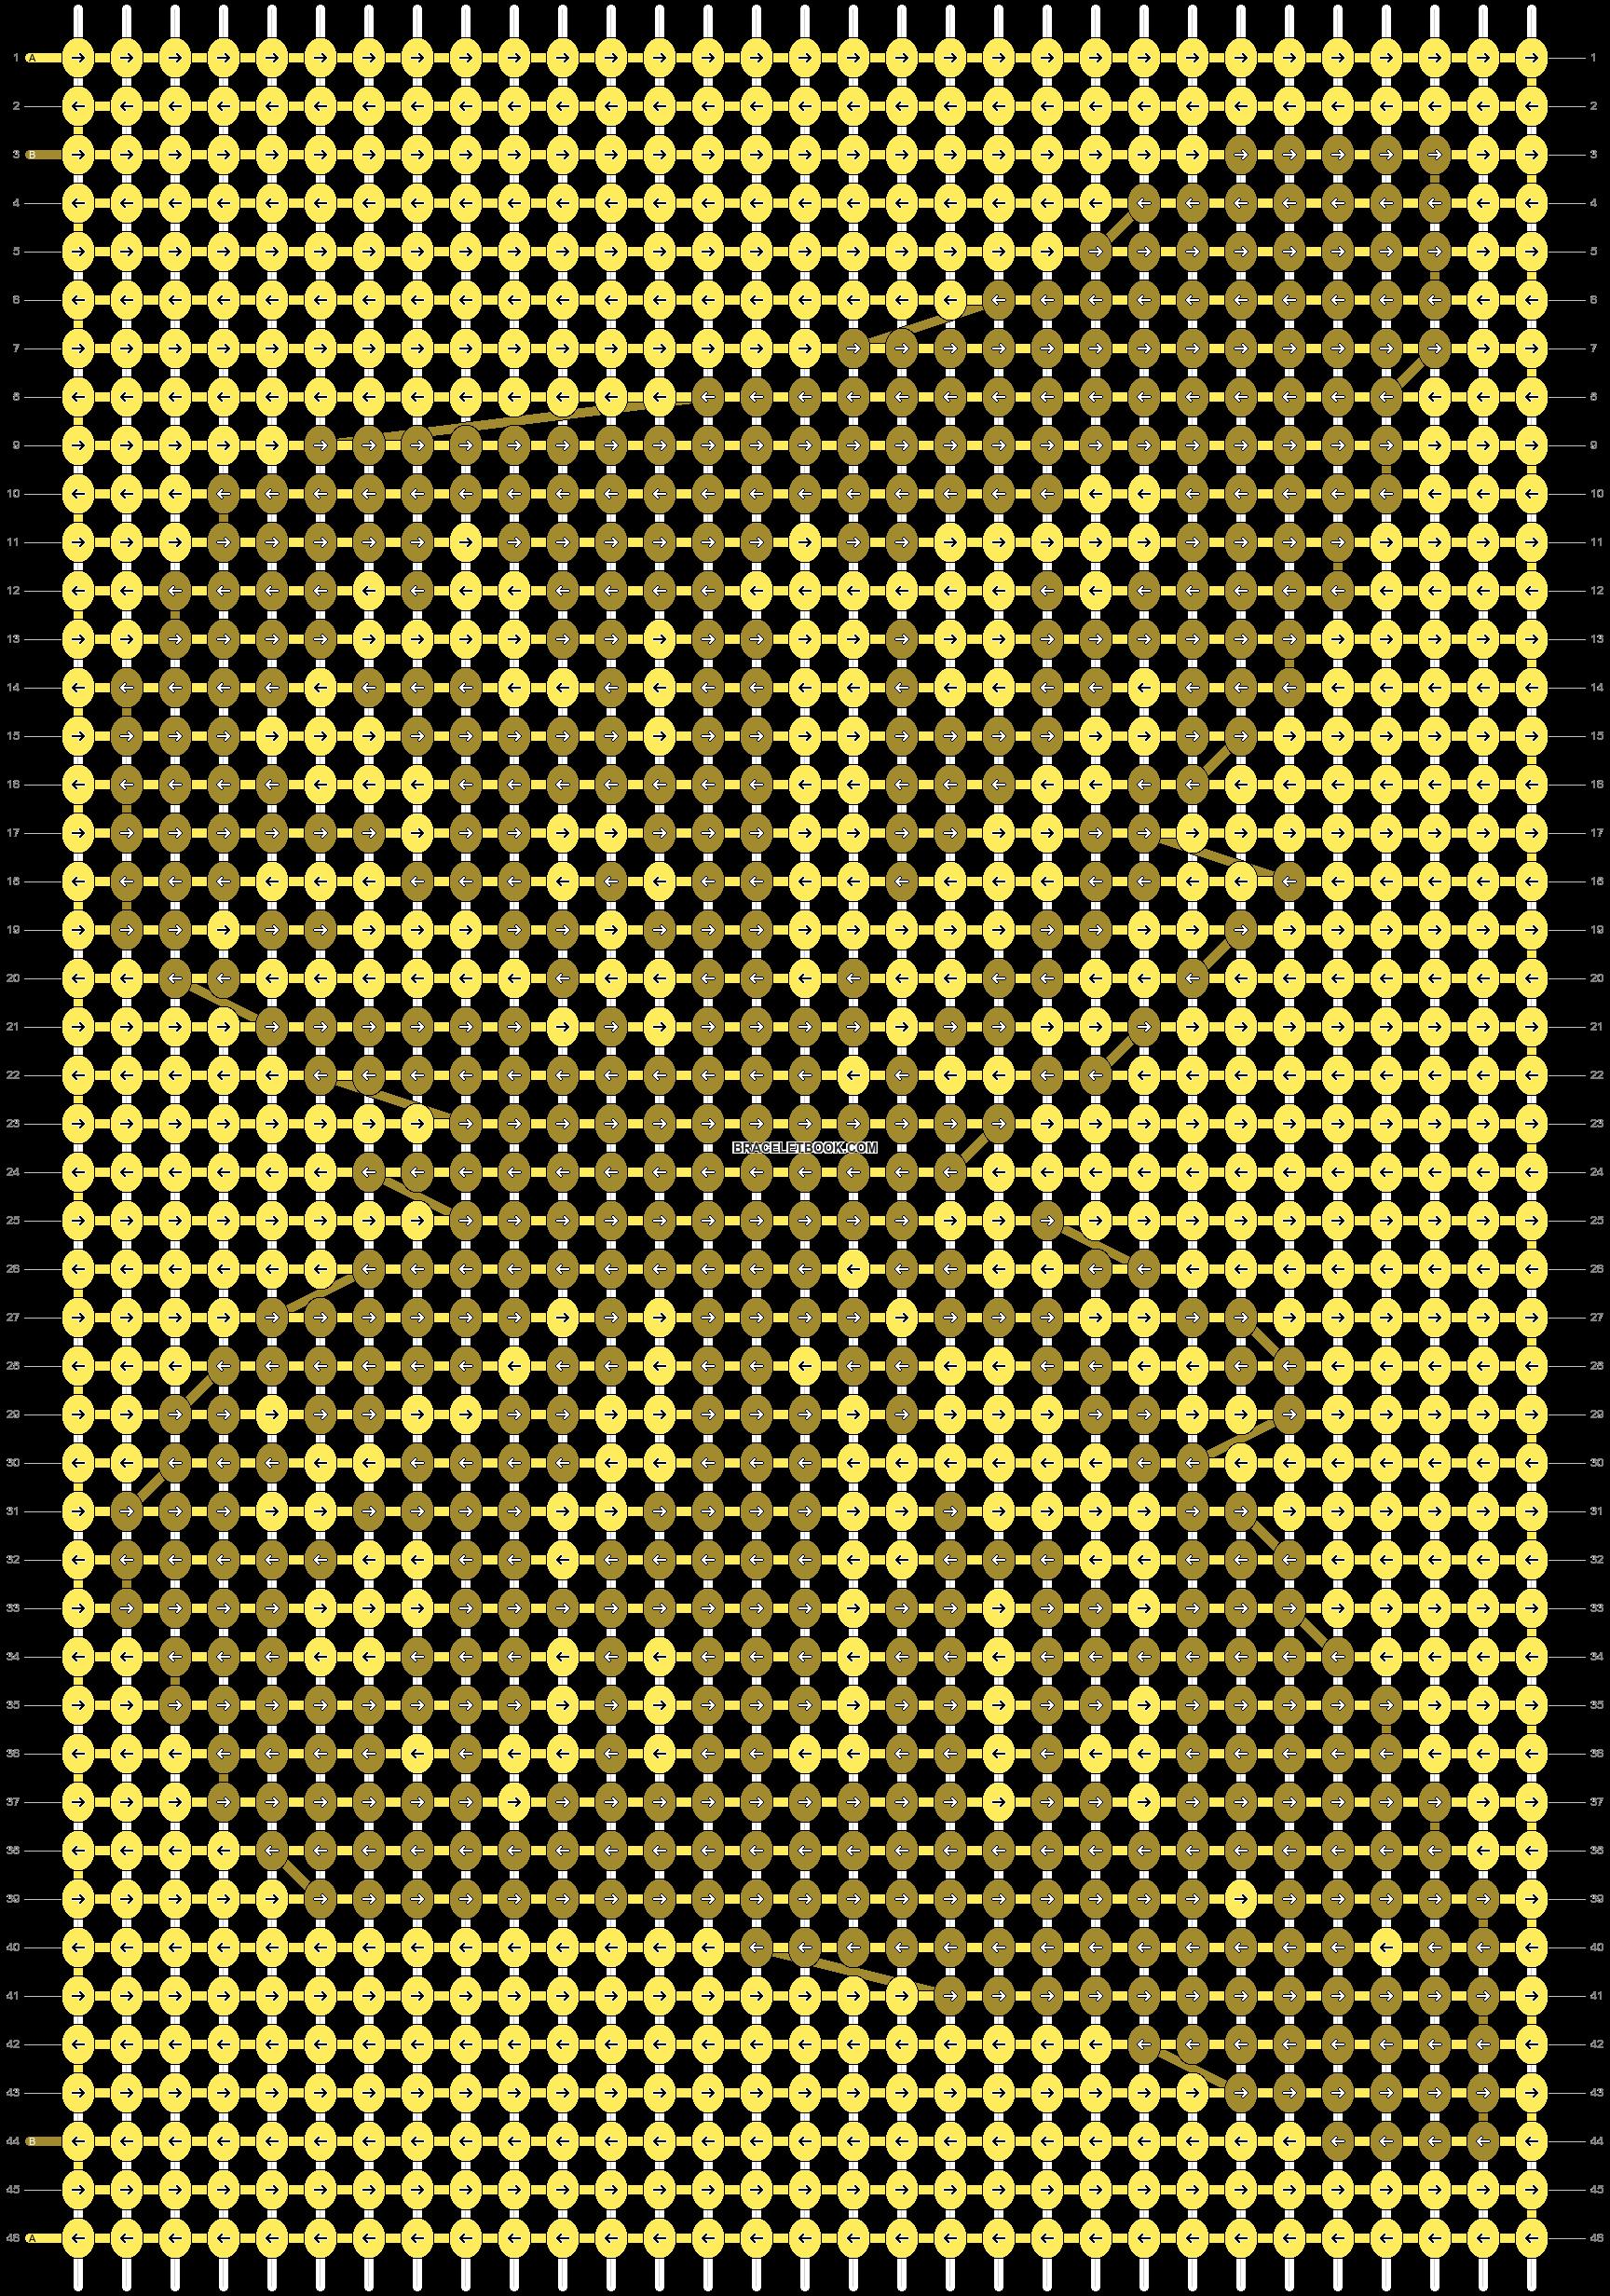 Alpha pattern #51210 pattern